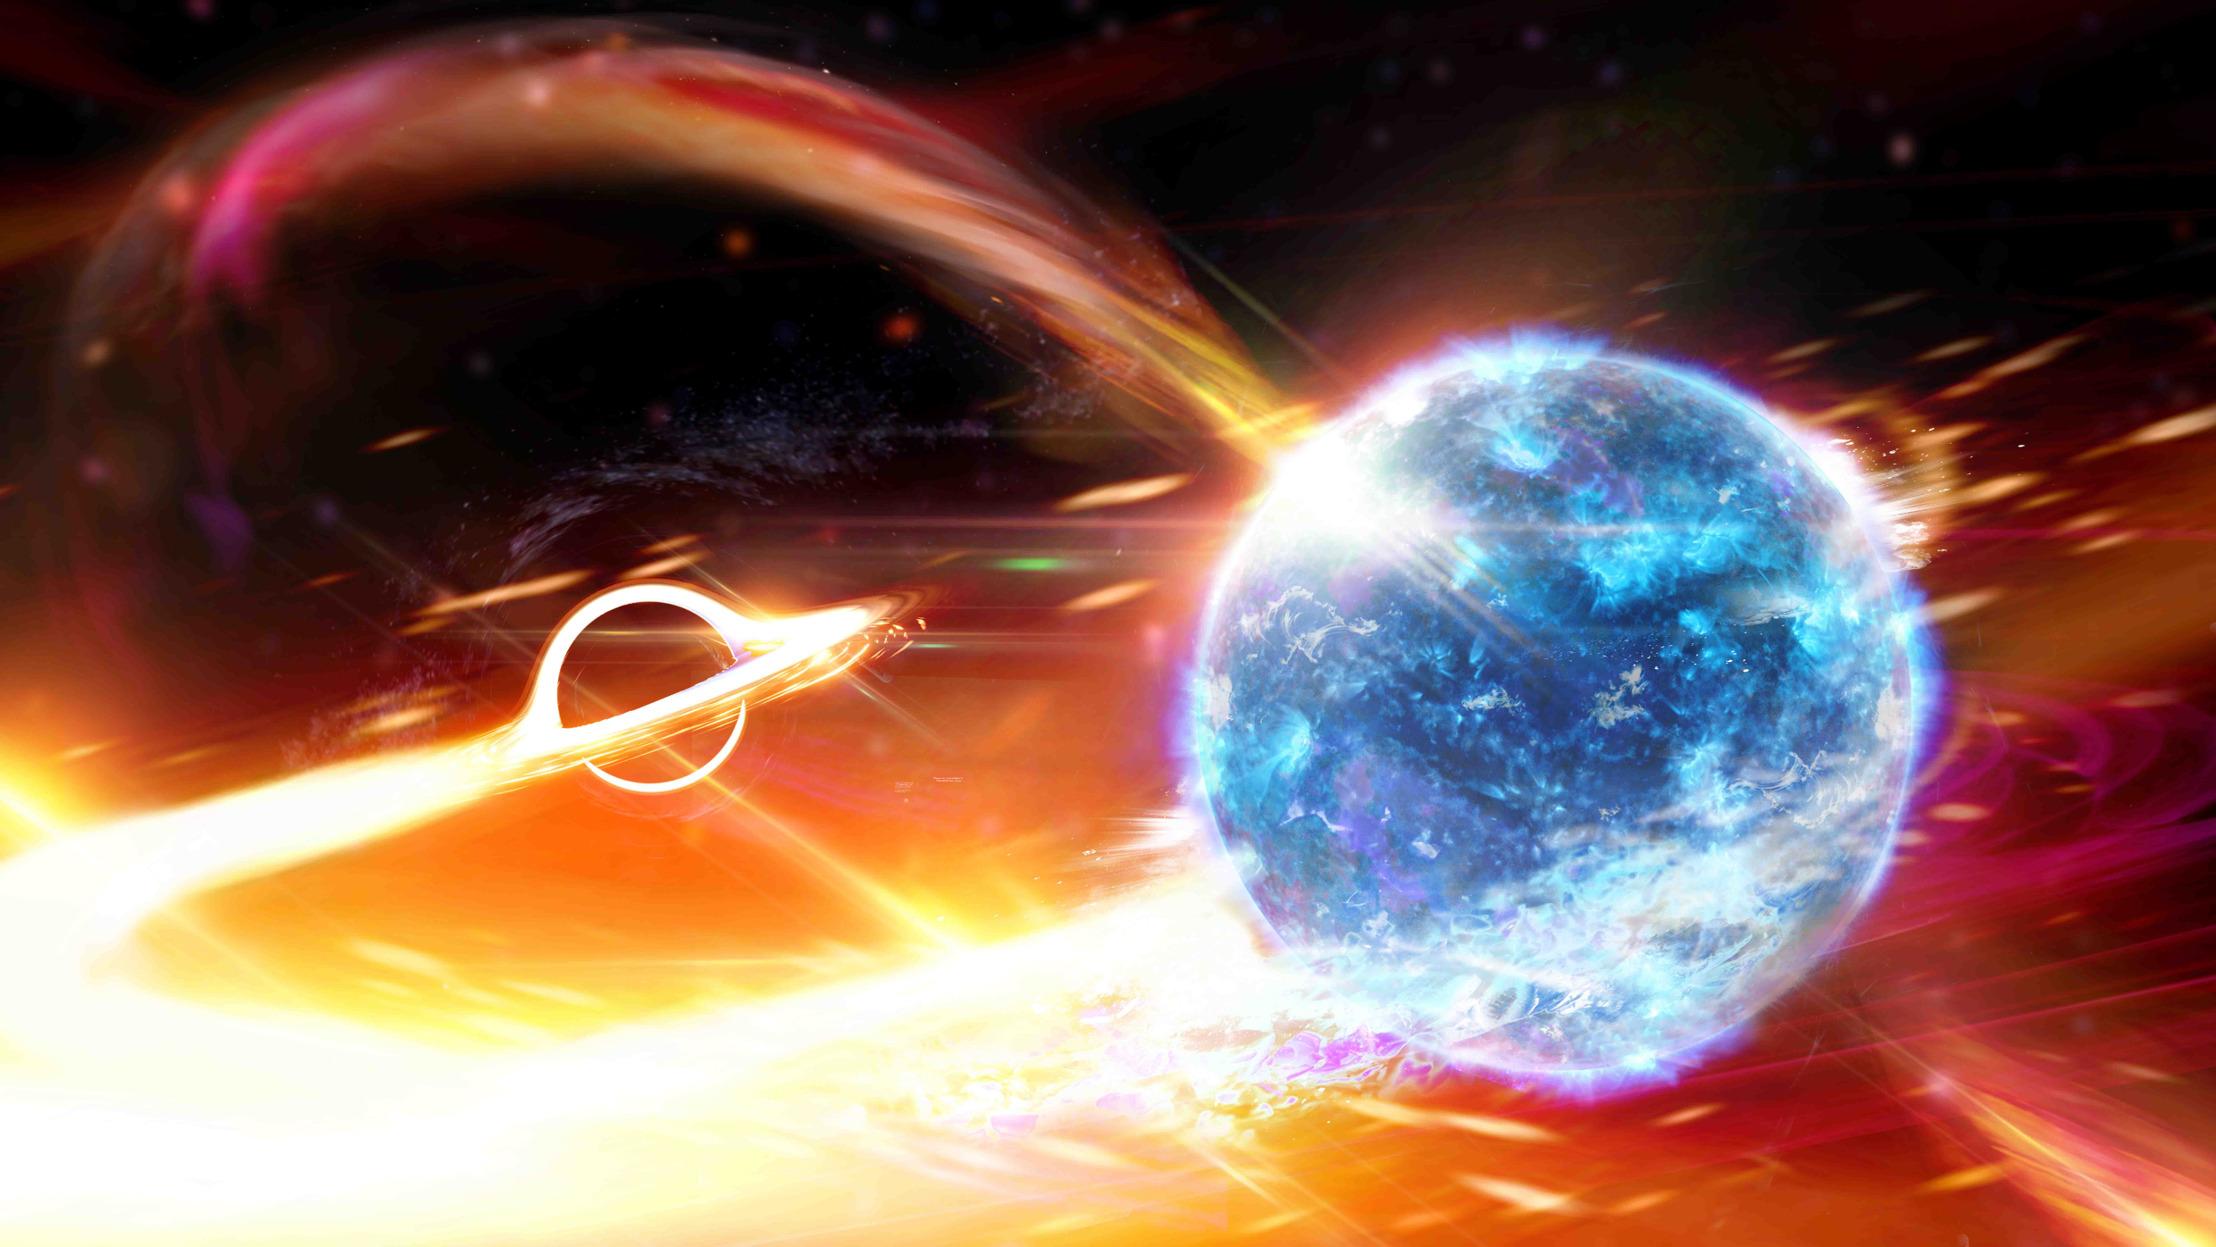 black hole neutron star merger